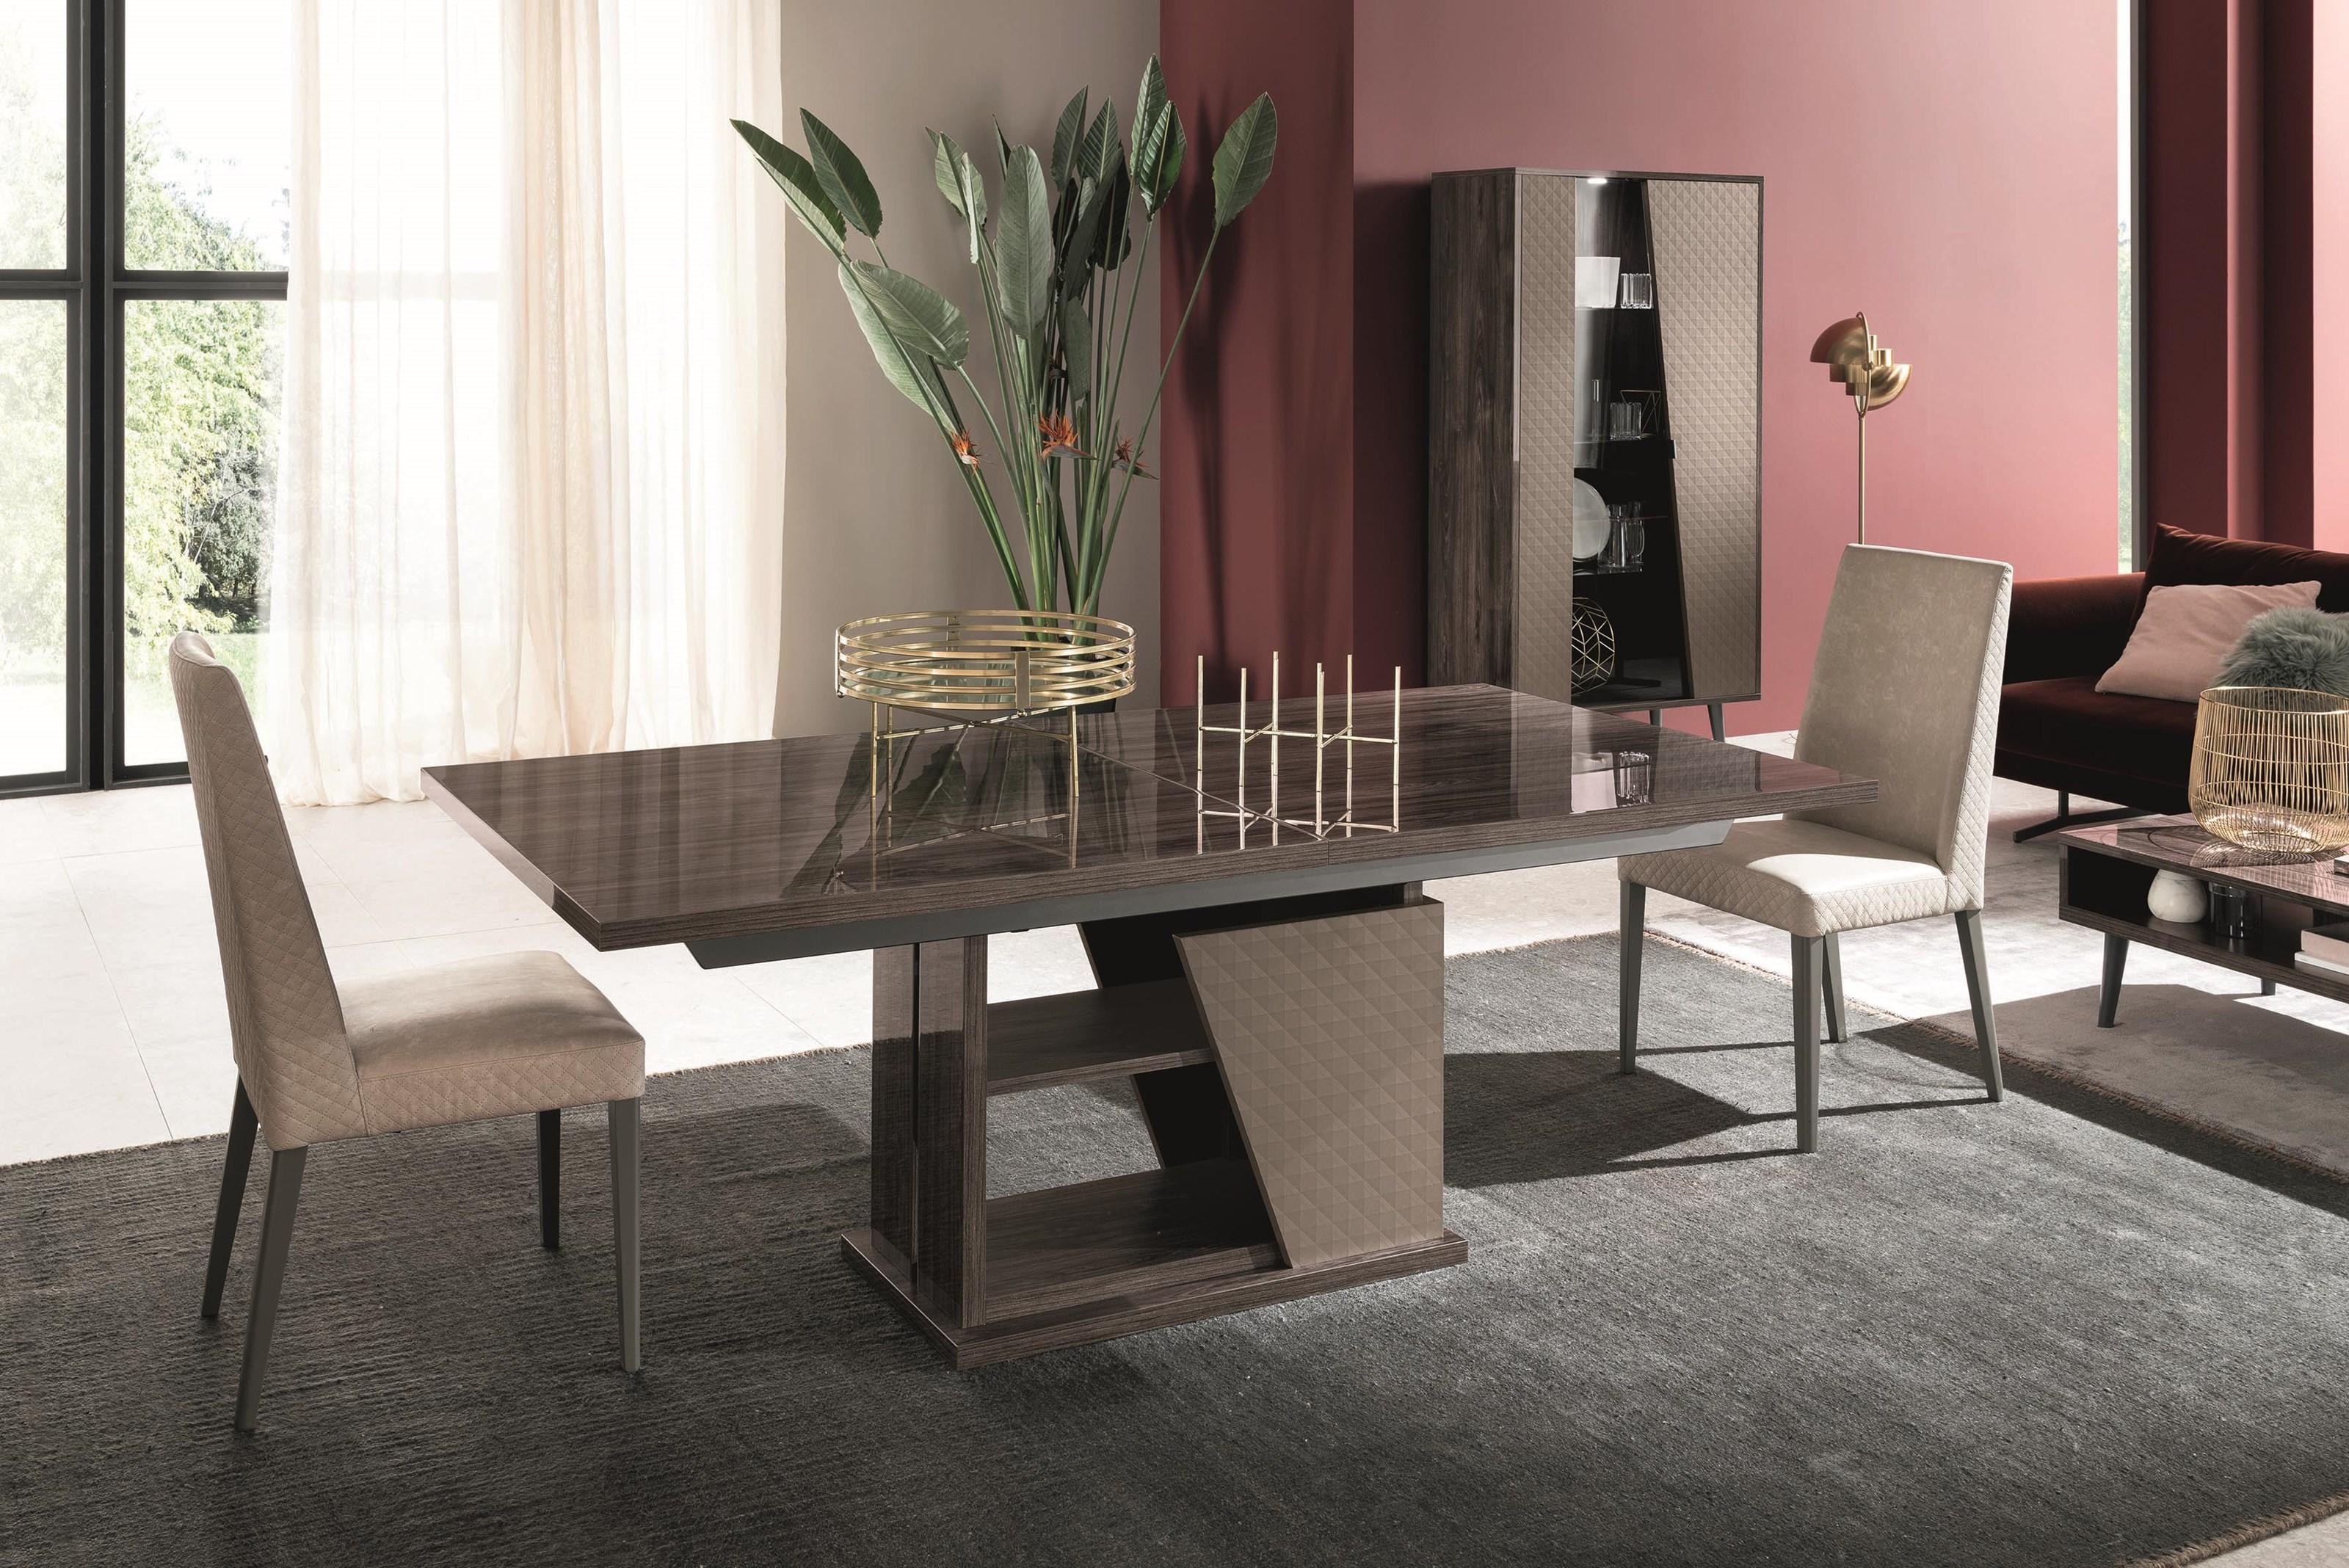 Frida Dining Table by Alf Italia at HomeWorld Furniture